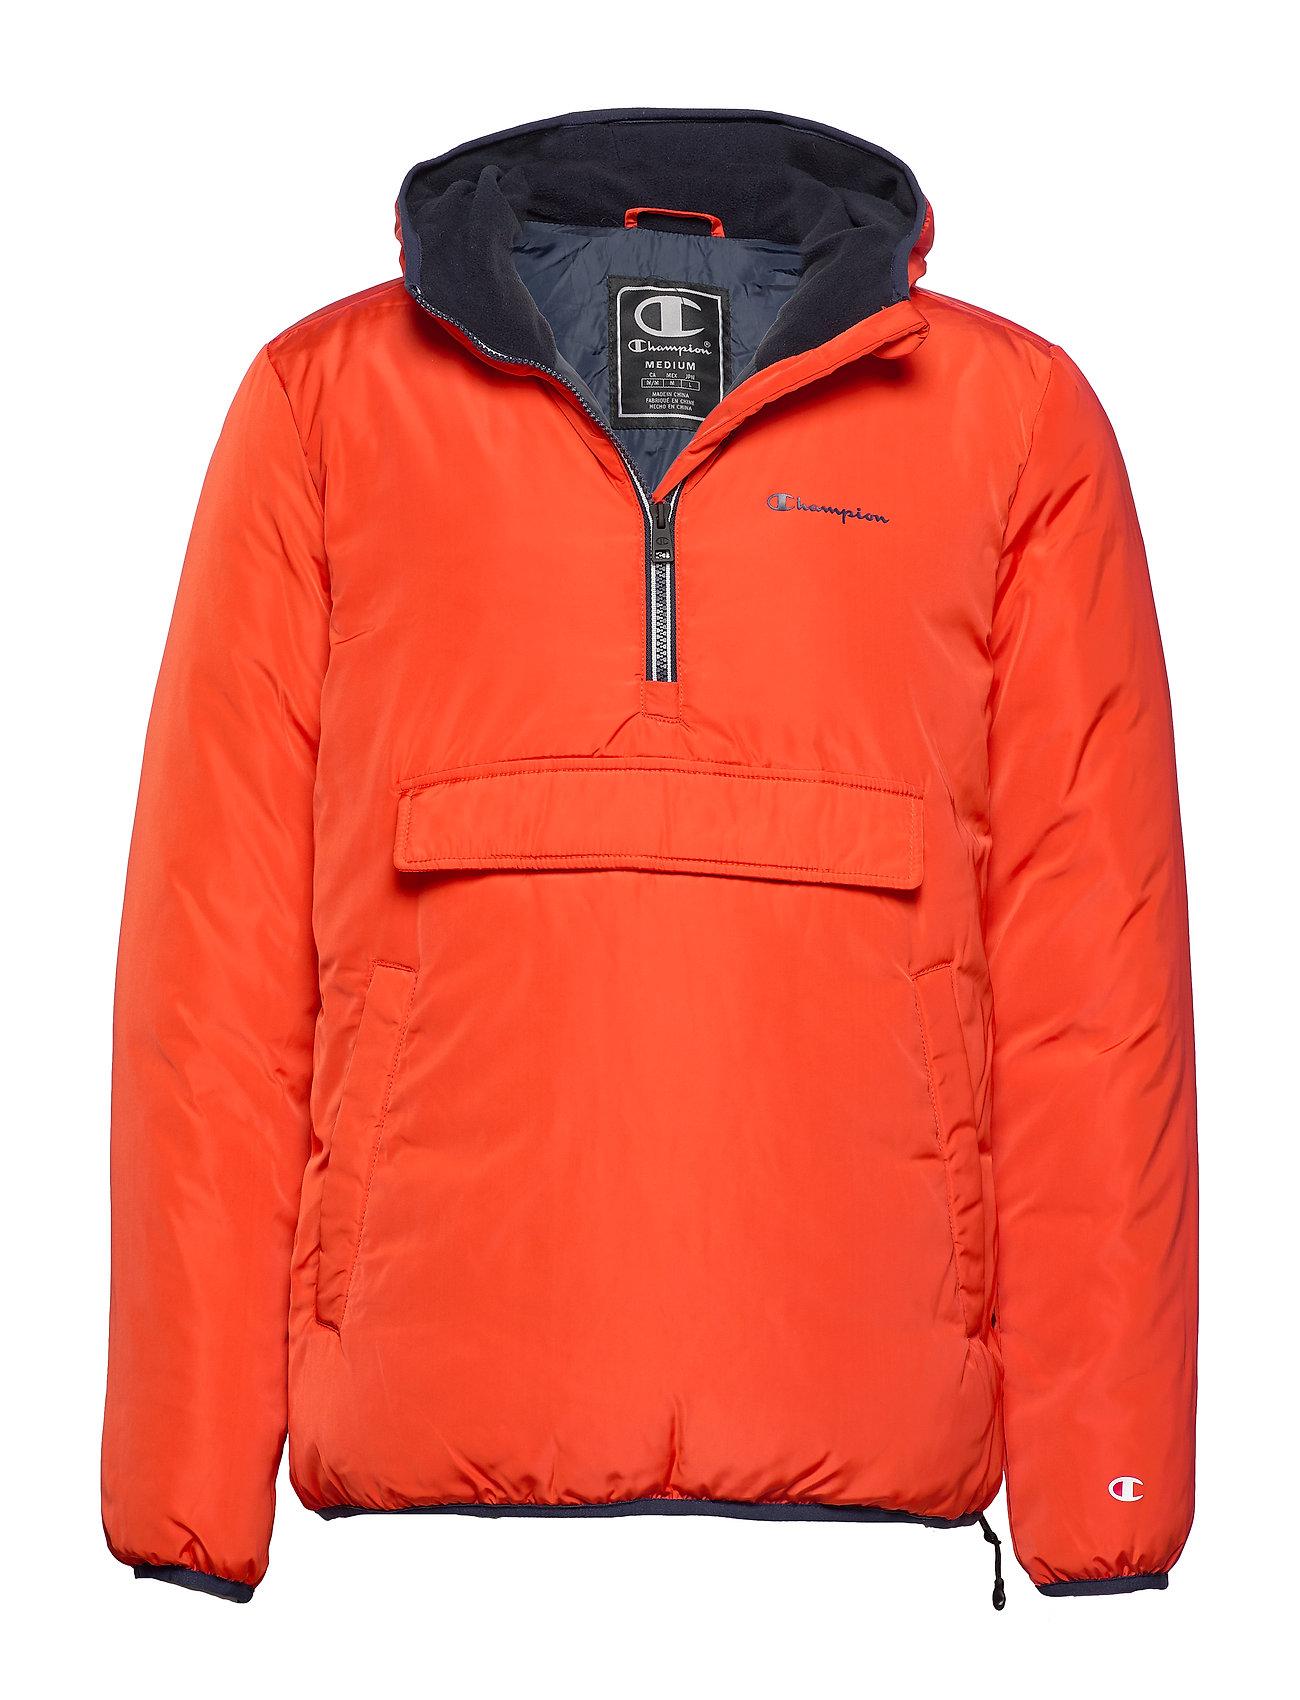 CHAMPION Hooded Jacket Outerwear Jackets Anoraks Rot CHAMPION